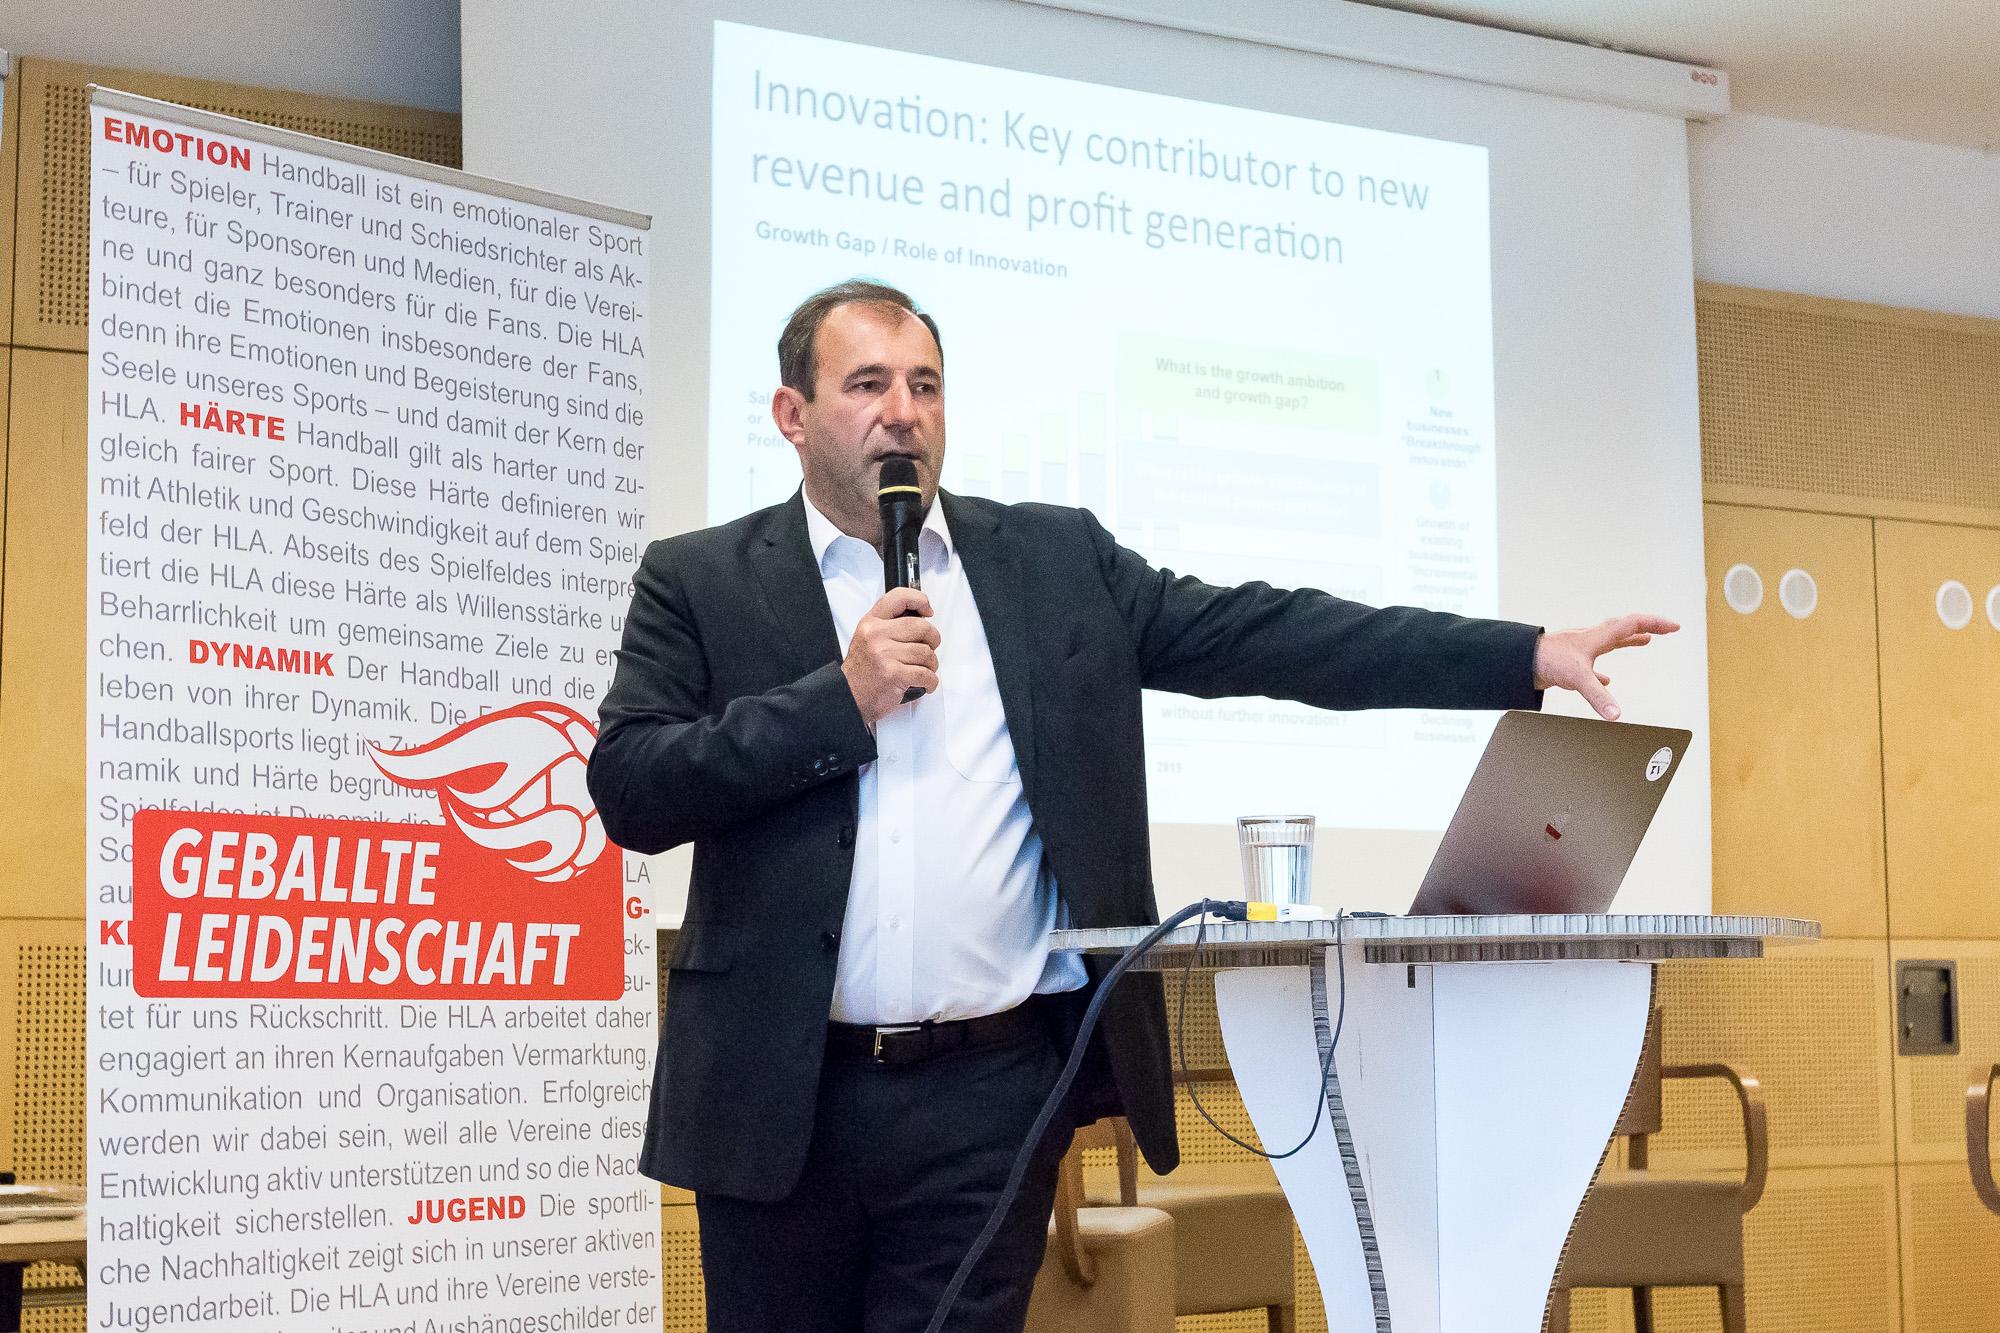 ©HLA/Sebastian Pucher - Keynote Dr. Boris Nemsic beim ERSTEN HLA BRANCHENTREFF mit cinnamon Hospitality